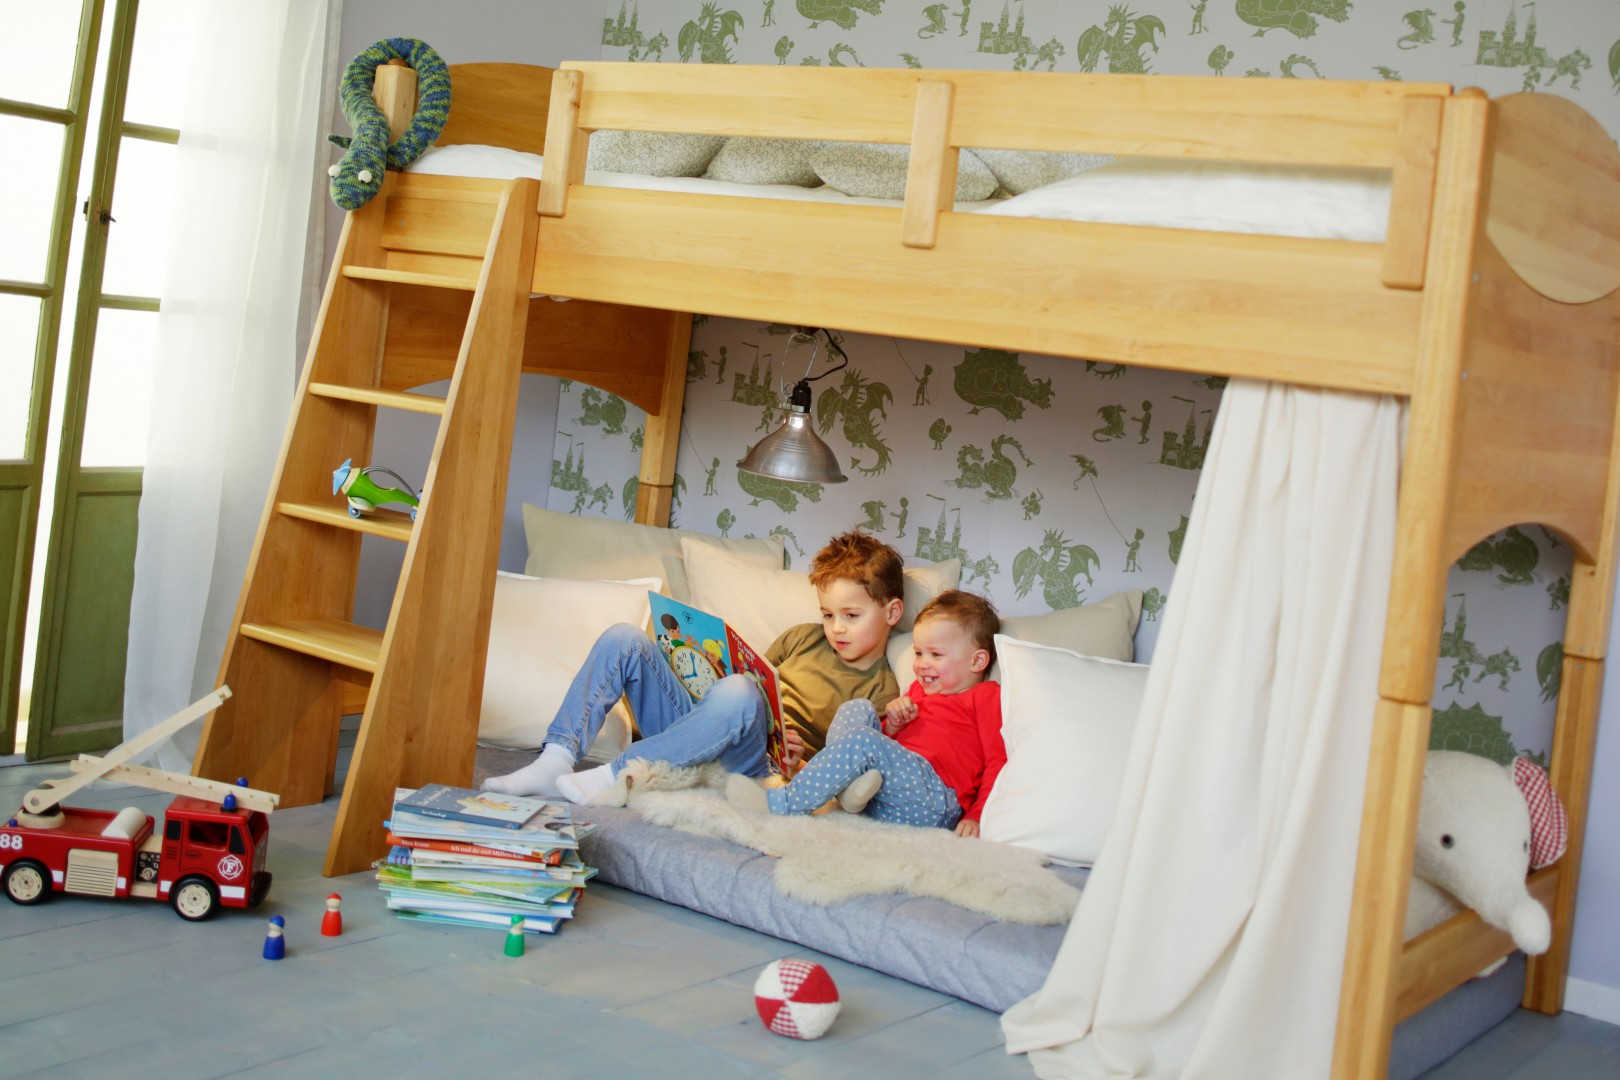 Full Size of Bioset Noah Hochbett 120 Cm Erle Regale Kinderzimmer Regal Sofa Weiß Kinderzimmer Hochbetten Kinderzimmer